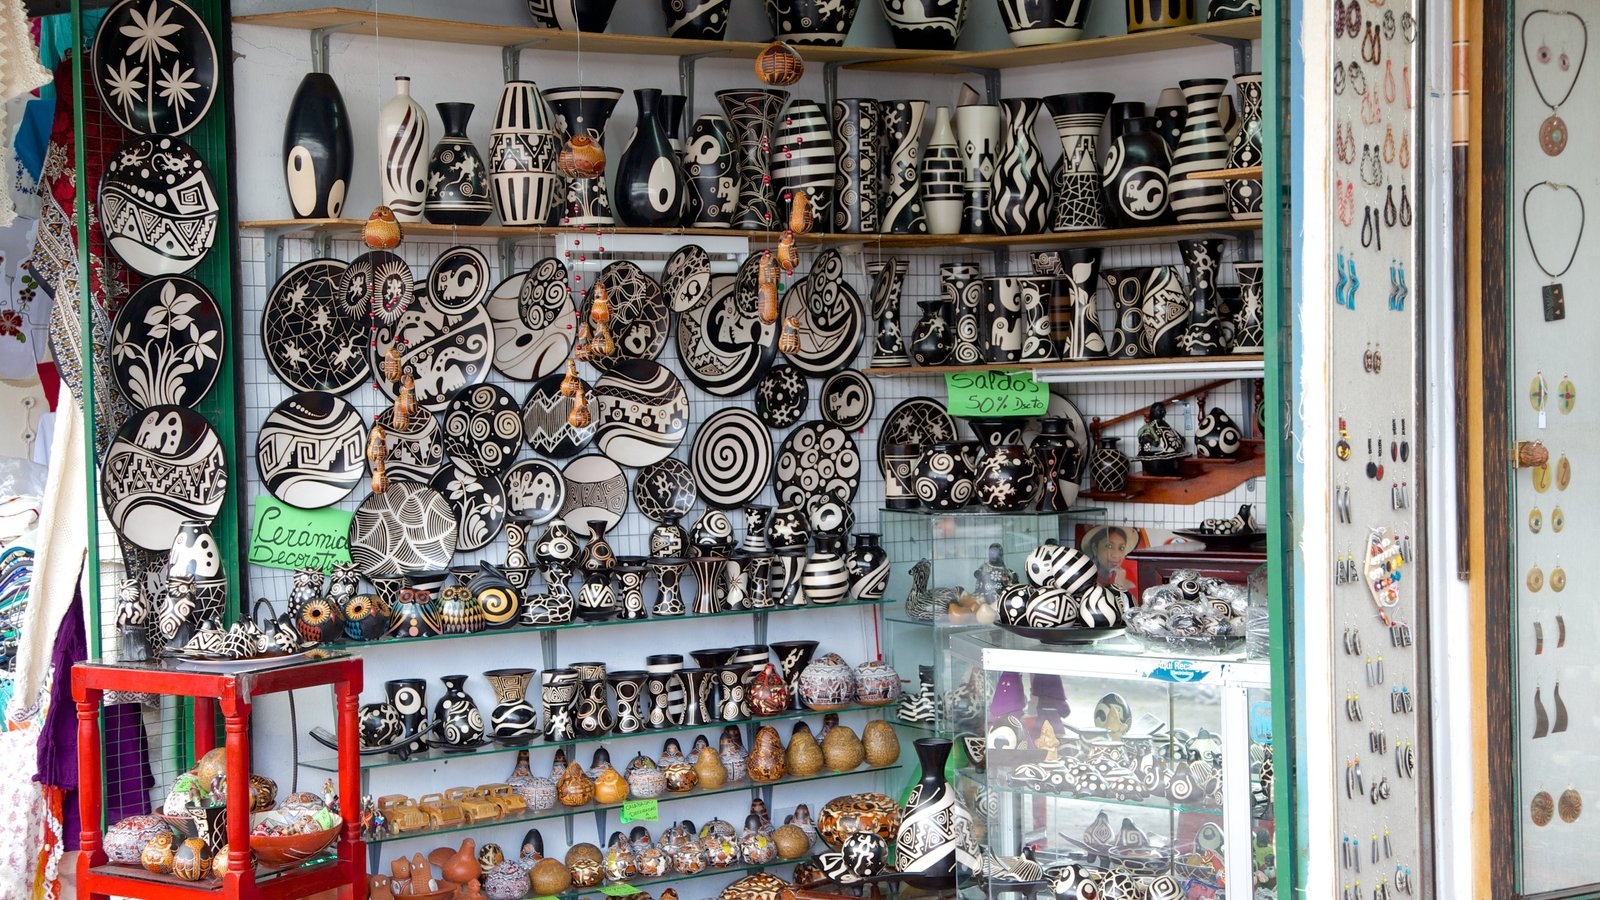 Mercado Artesanal La Mariscal que inclui mercados, vistas internas e compras